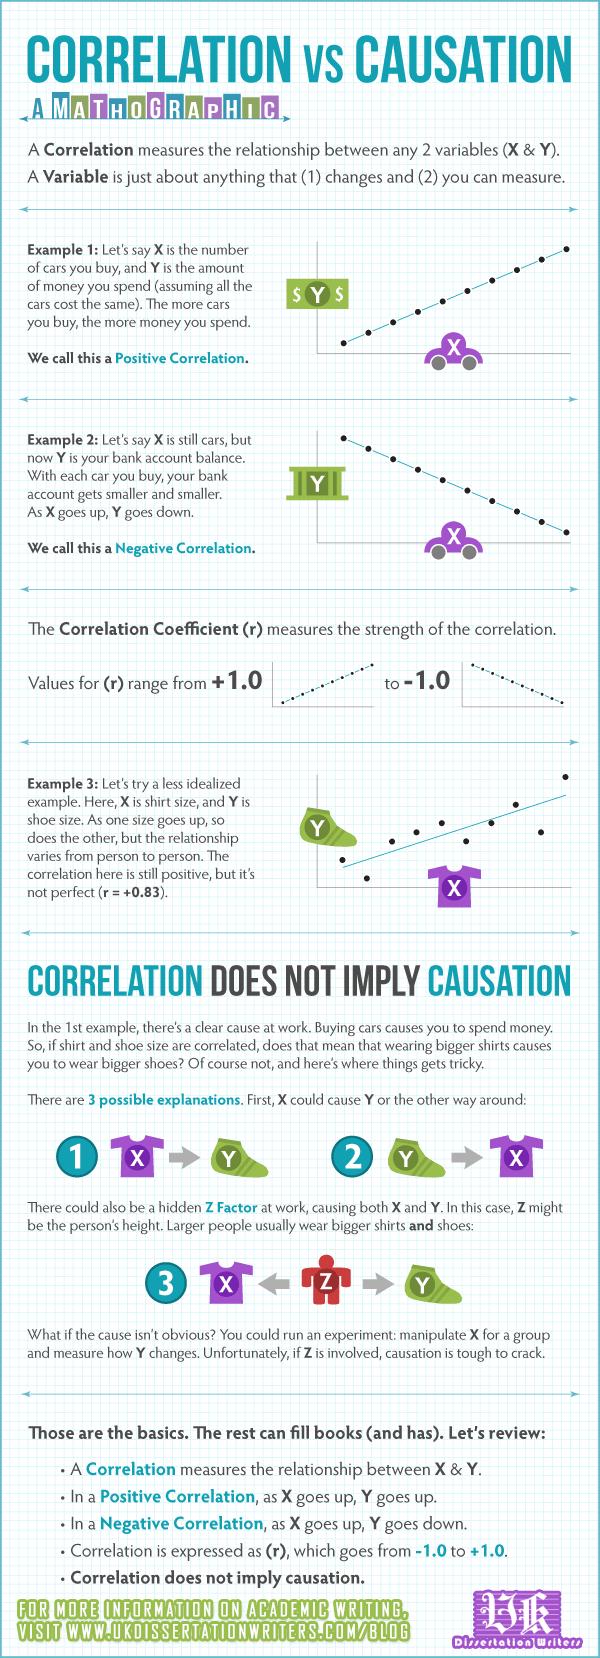 Correlation-Causation-UK-Dissertation-Writers